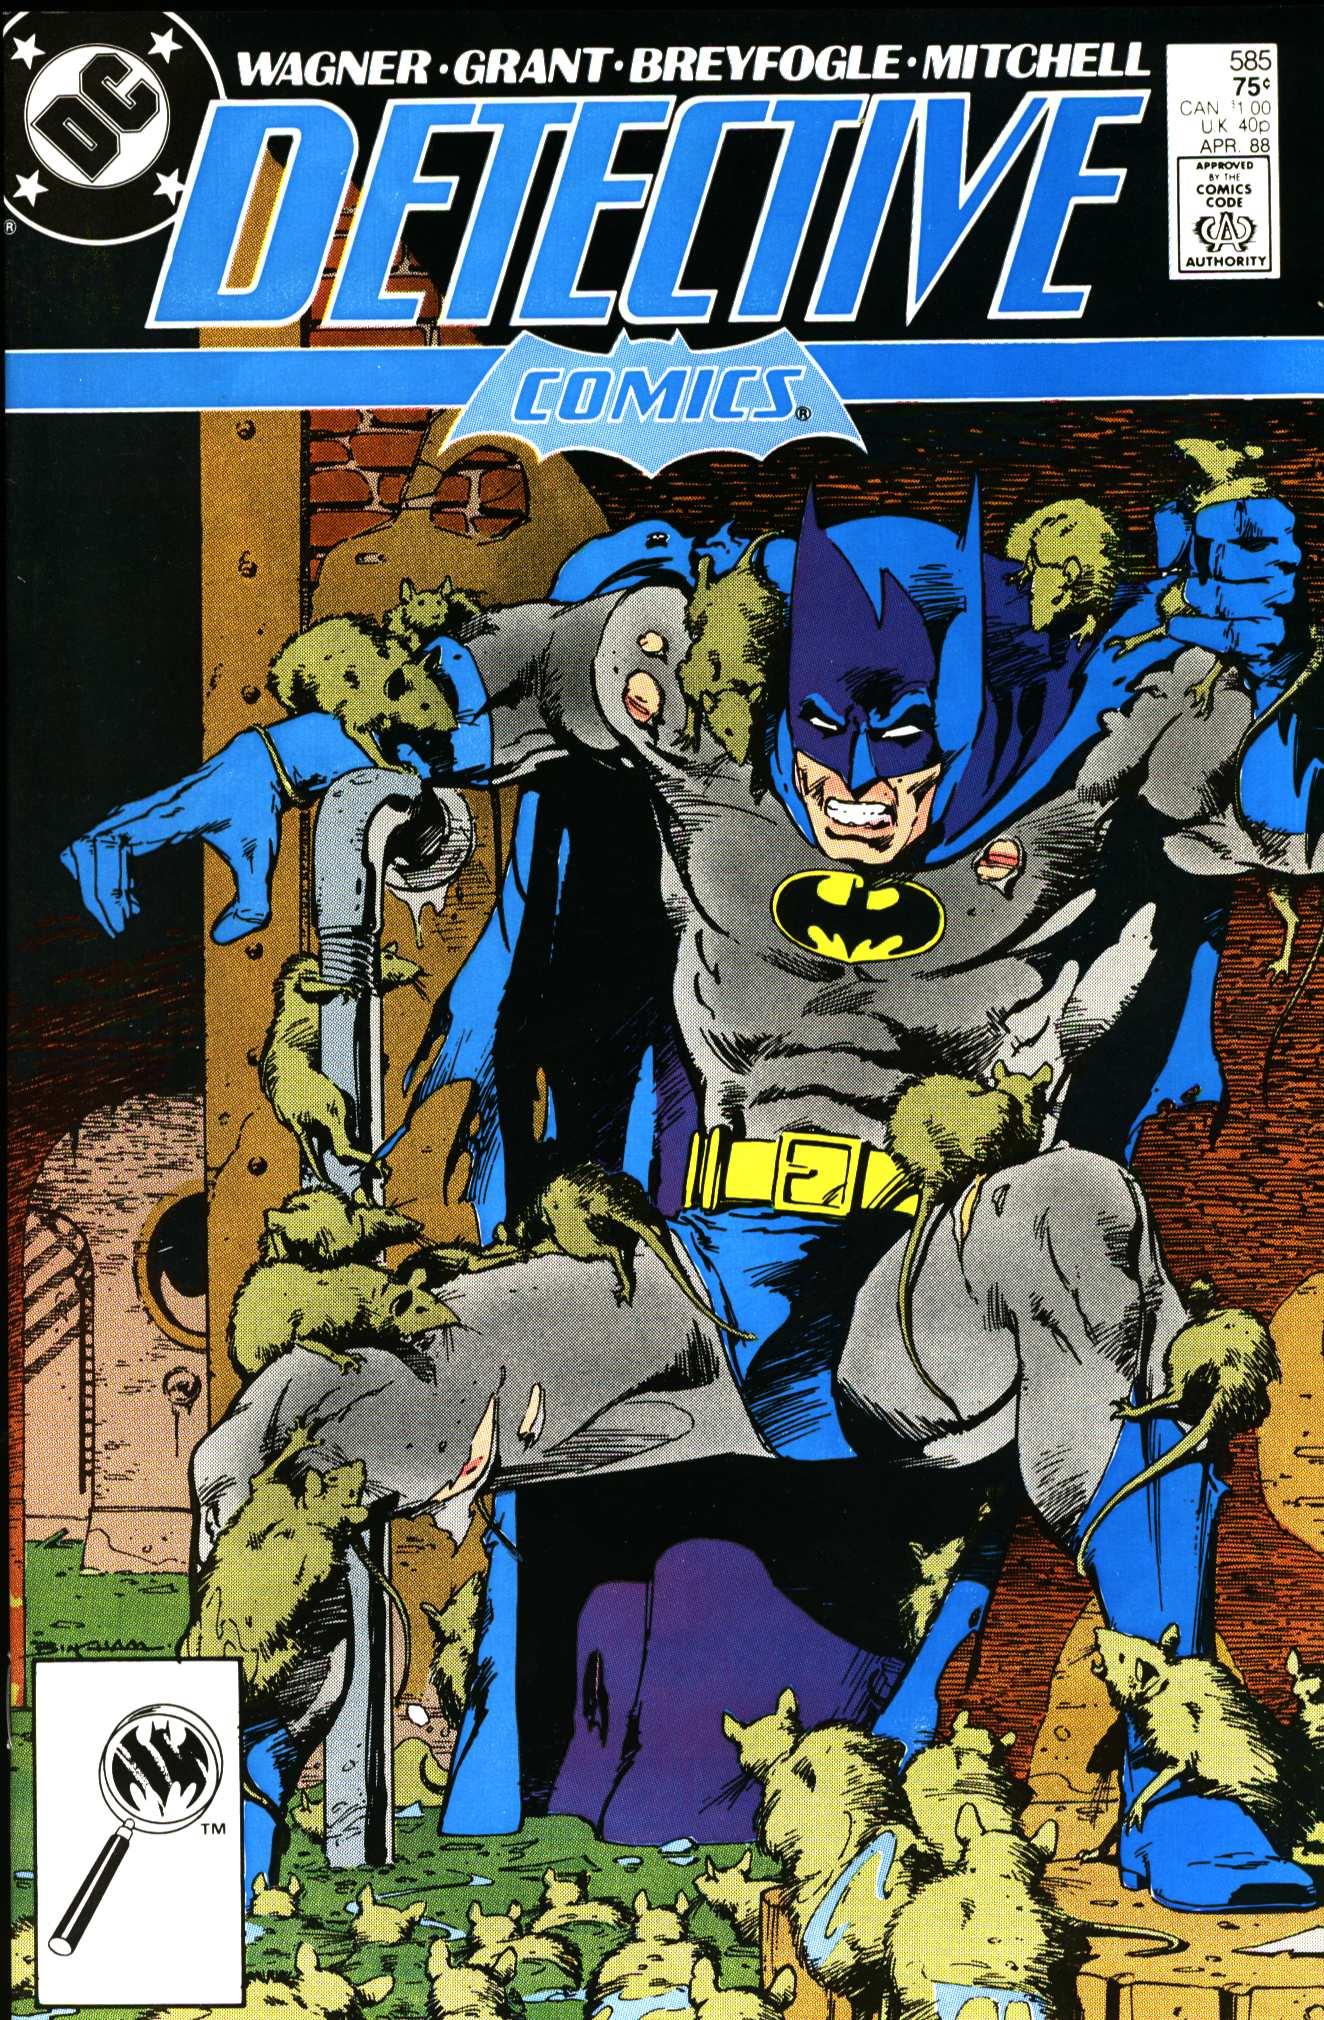 Detective Comics (1937) 585 Page 0